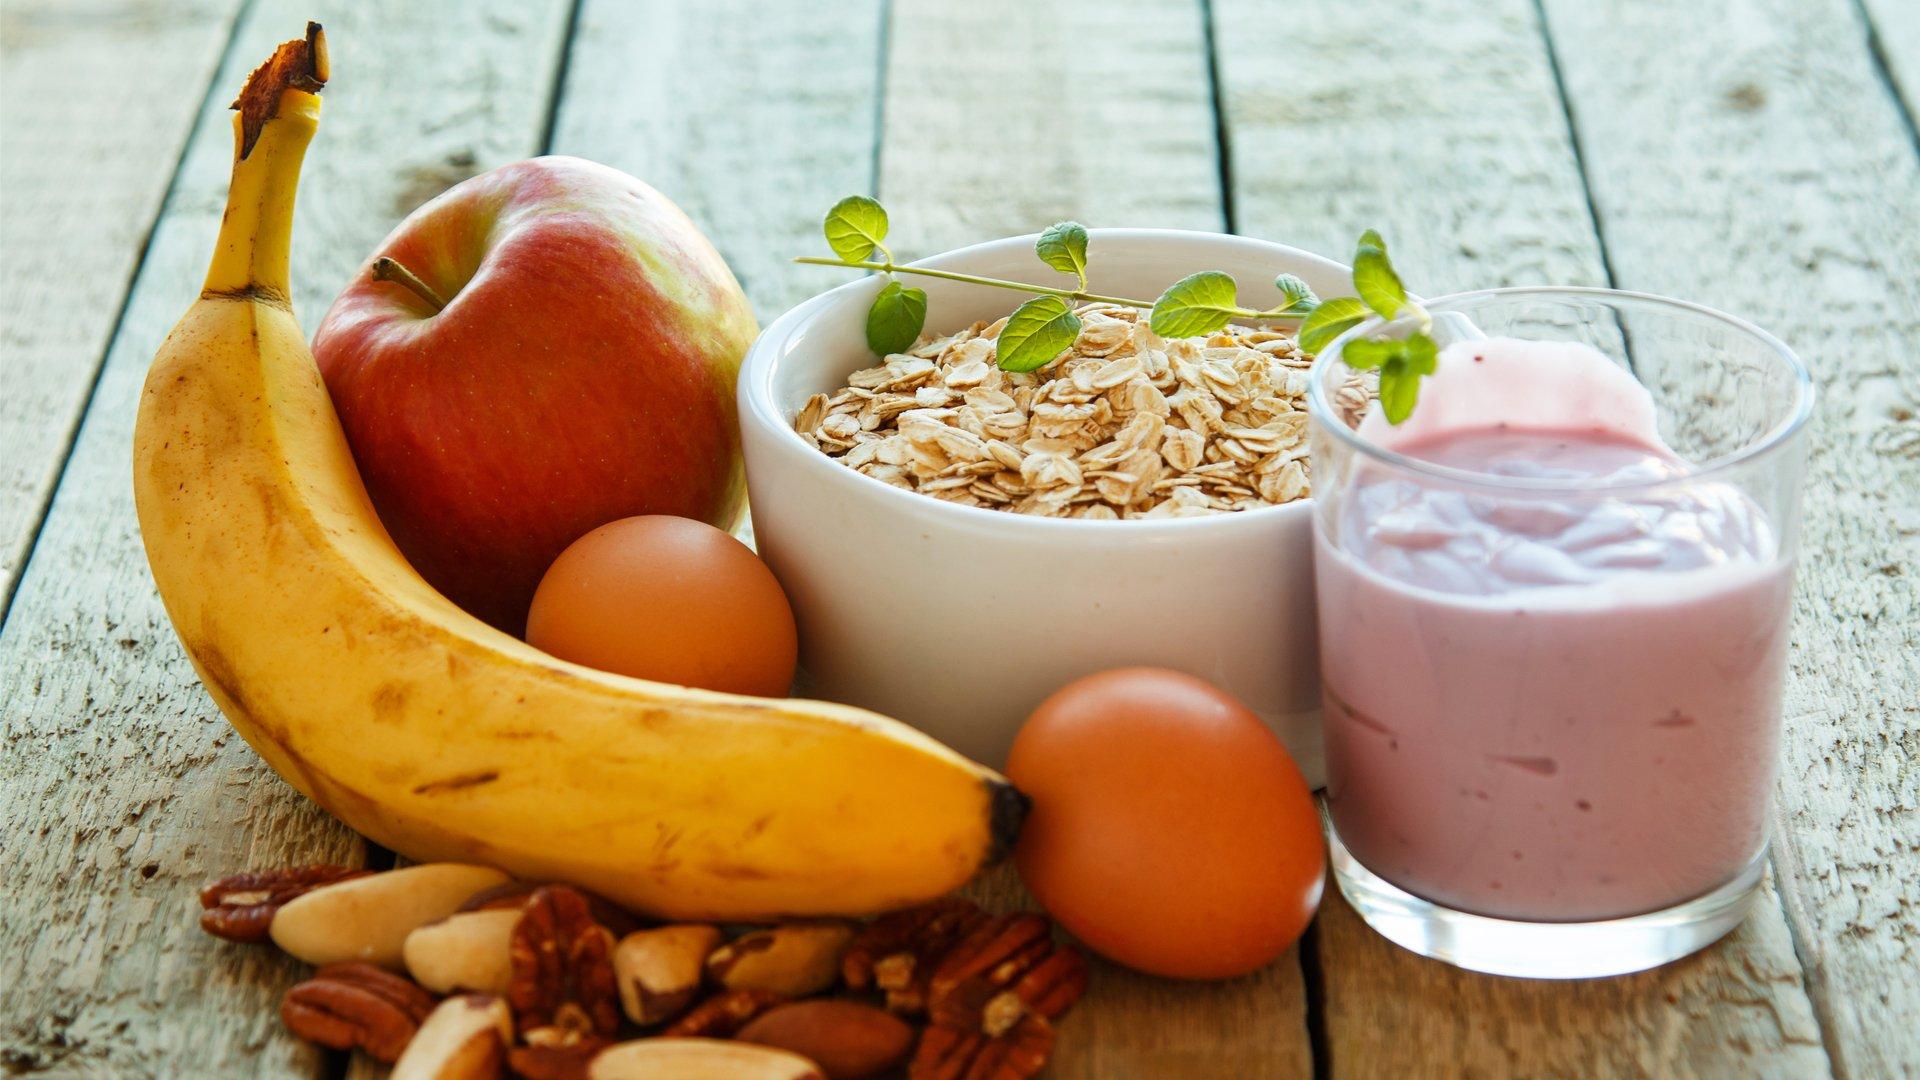 Healthy Breakfast Ideas for Middle Schoolers during Exam Week